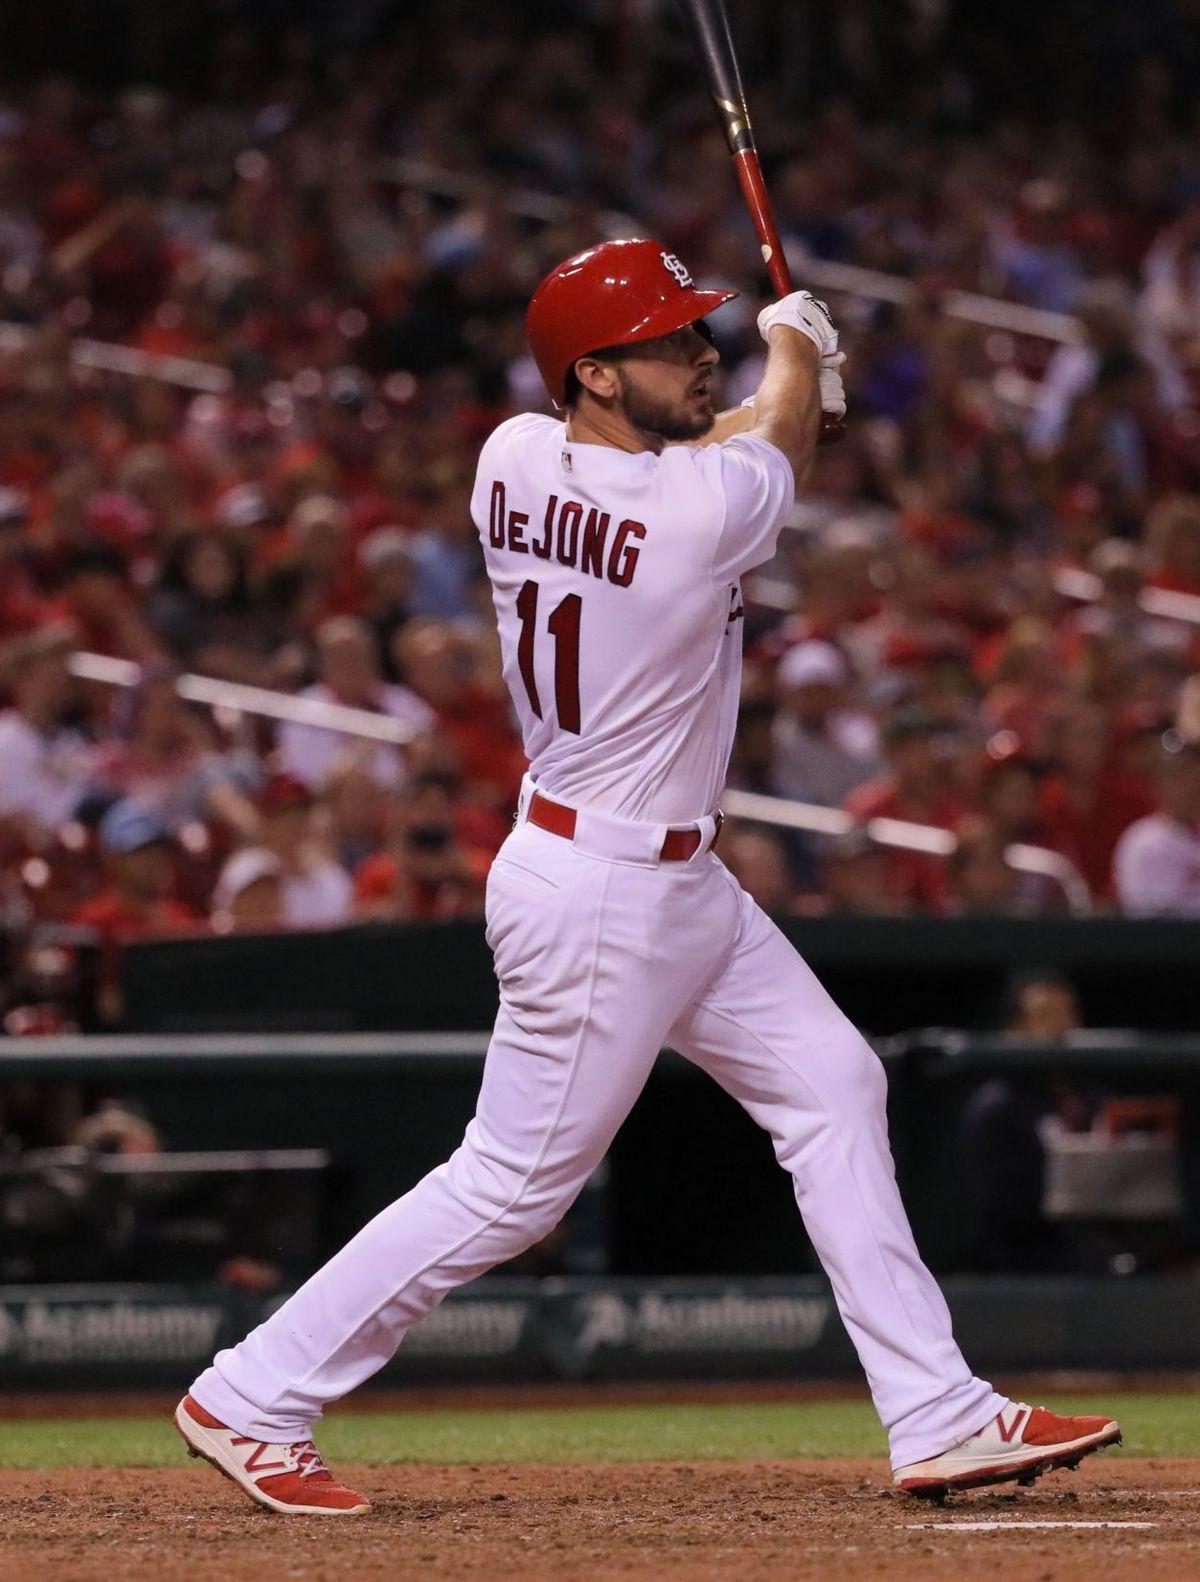 Cards Keep Win Streak Going With 8 5 Win Over Braves St Louis Cardinals Baseball Stl Cardinals Baseball Braves Baseball